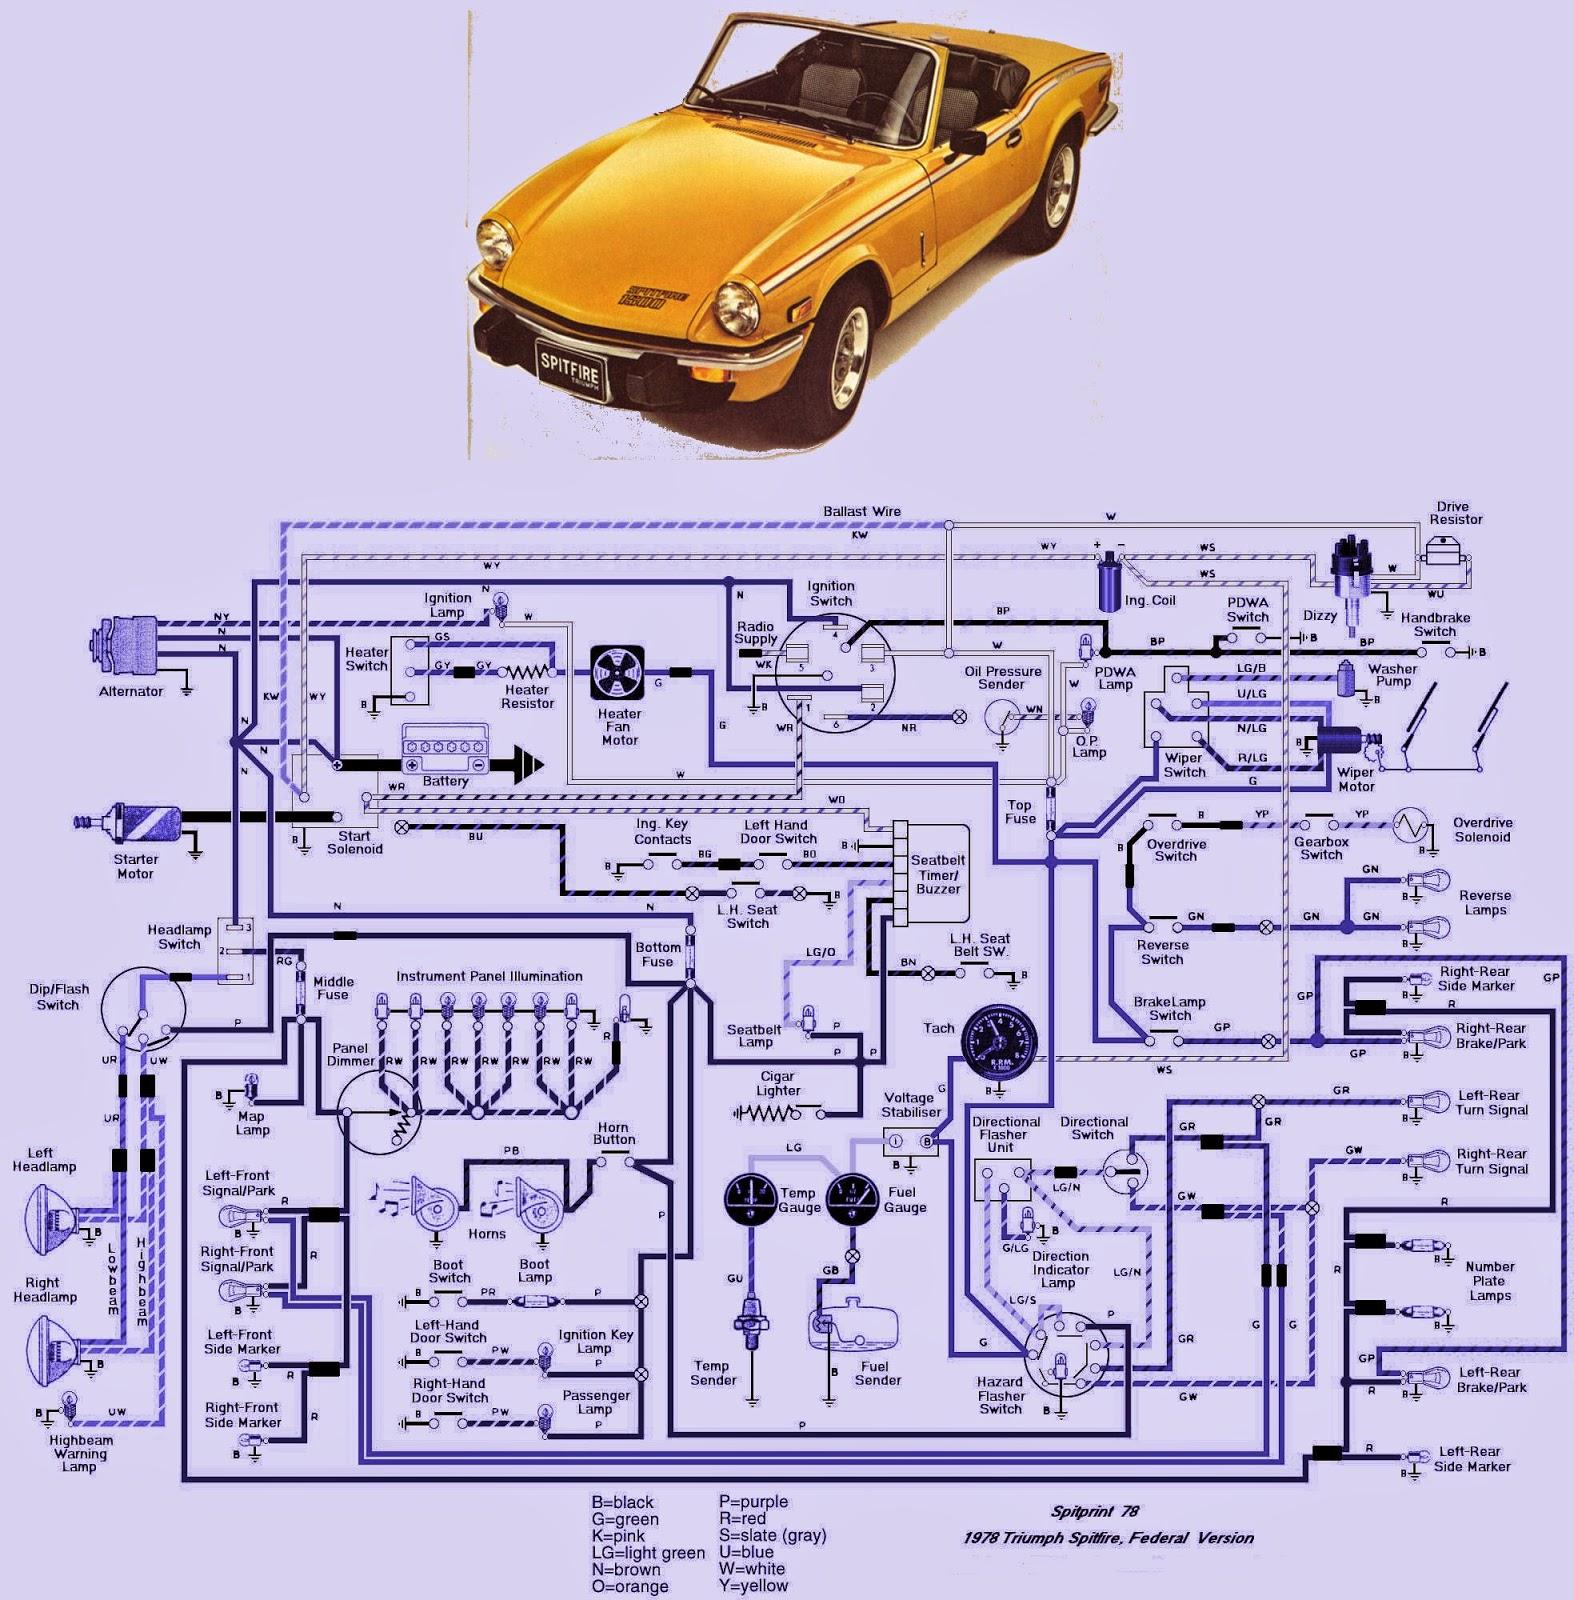 medium resolution of 1978 triumph spitfire wiring diagram trusted wiring diagram triumph spitfire wiring schematic 1978 triumph spitfire wiring